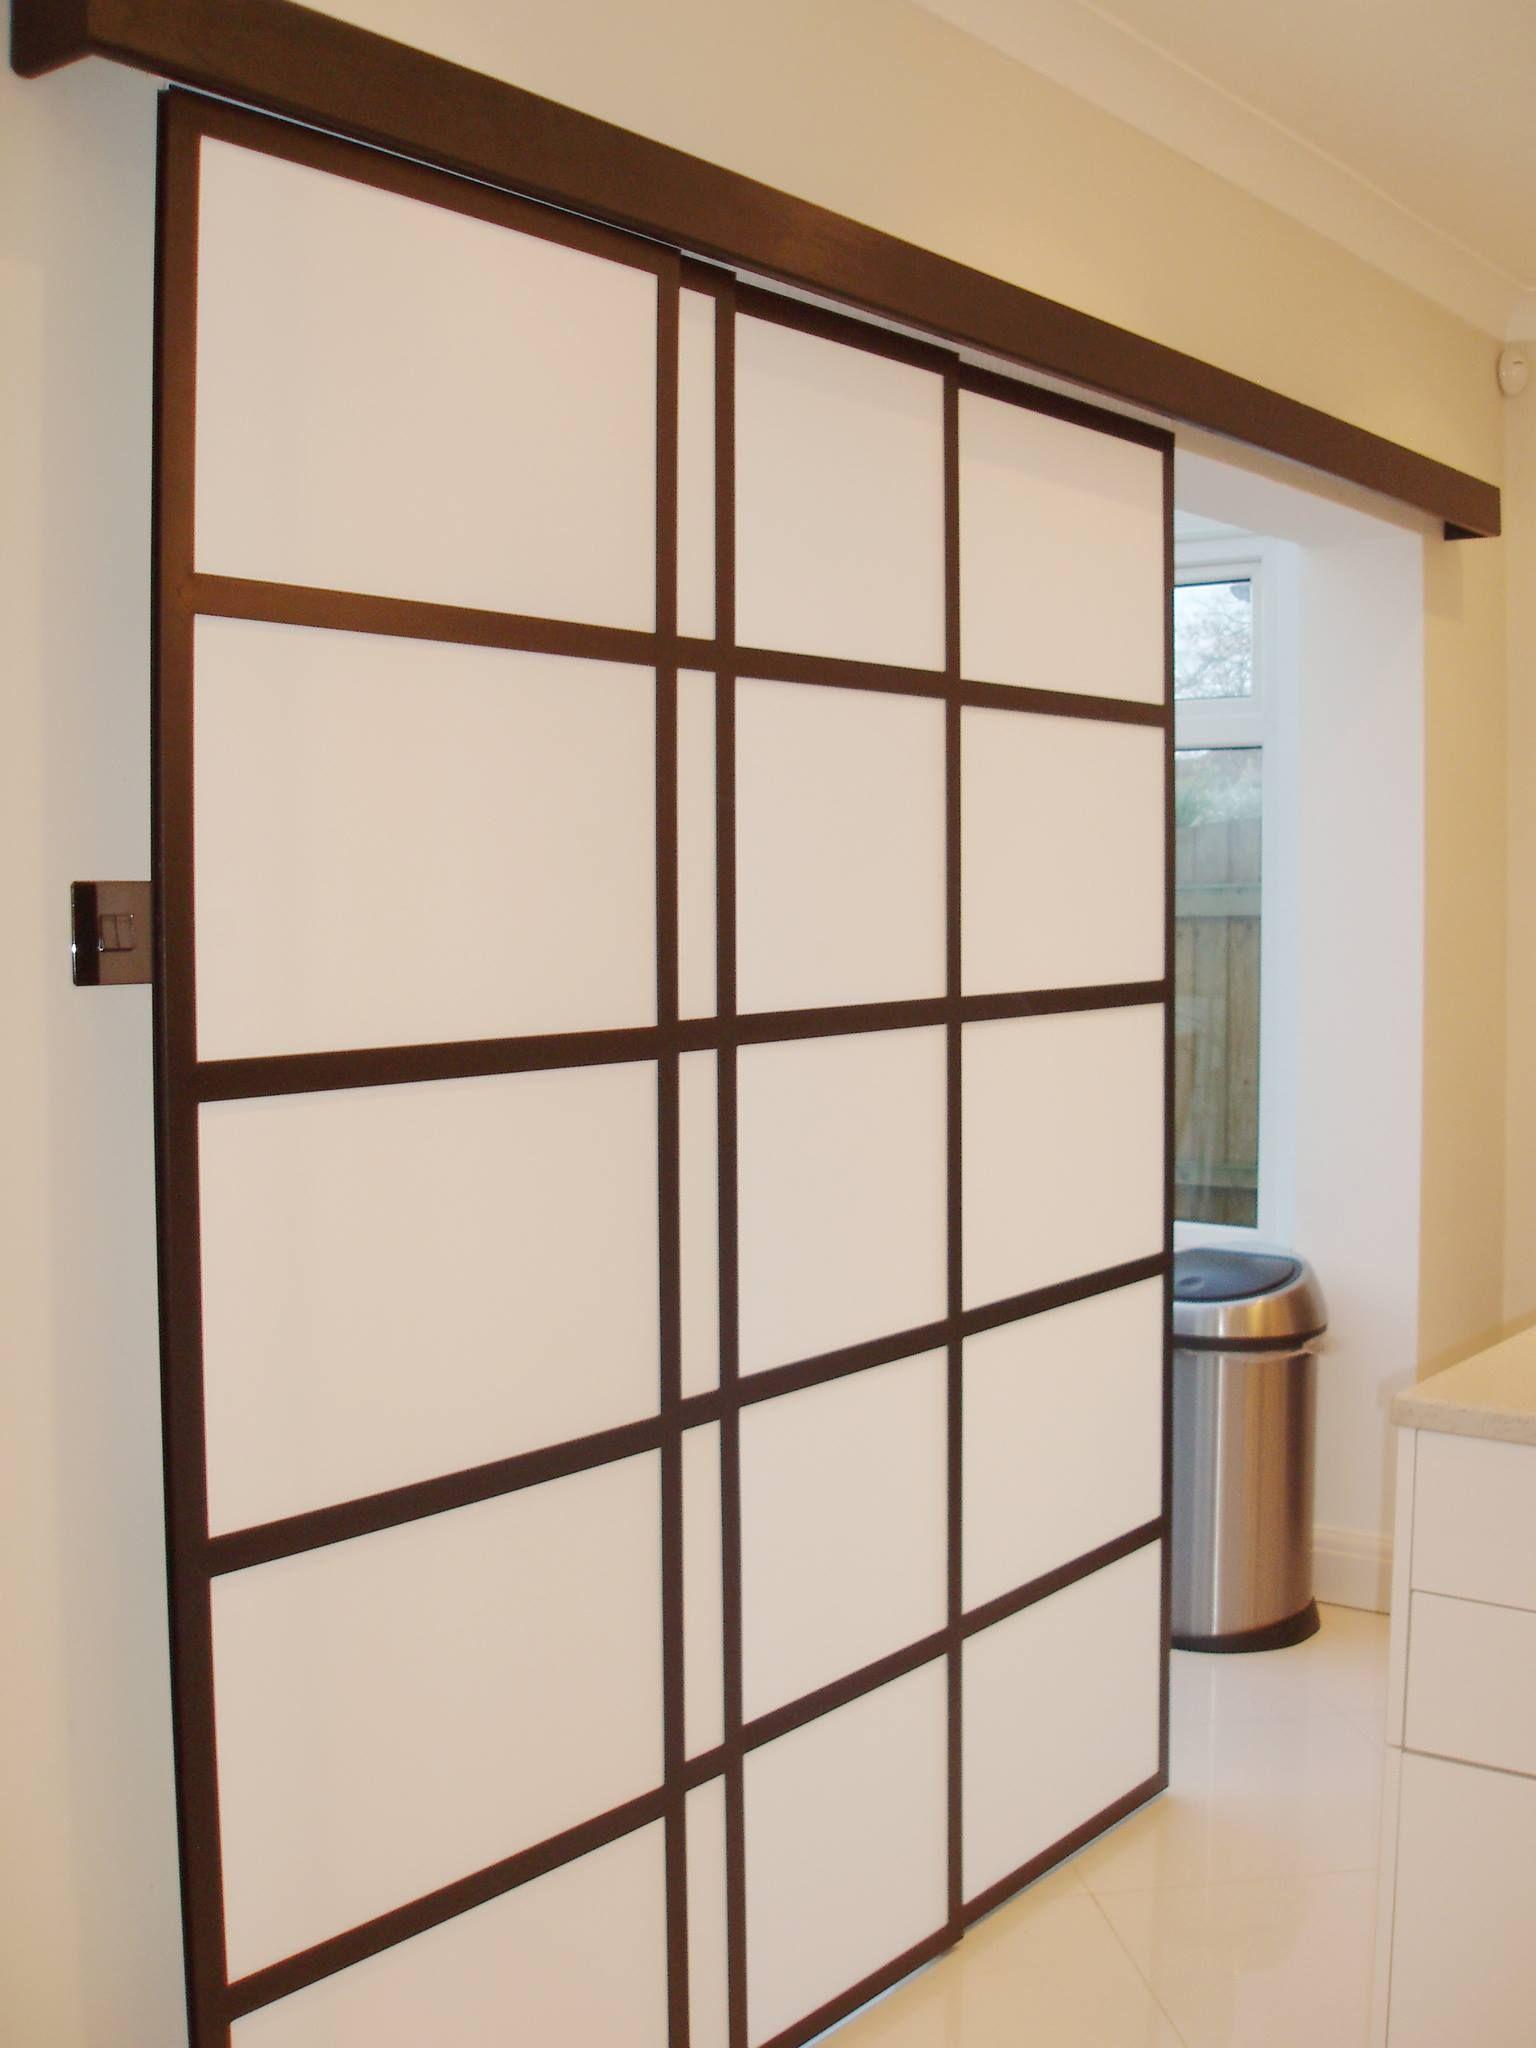 Japanese Shoji Panel blinds Room Dividers Window